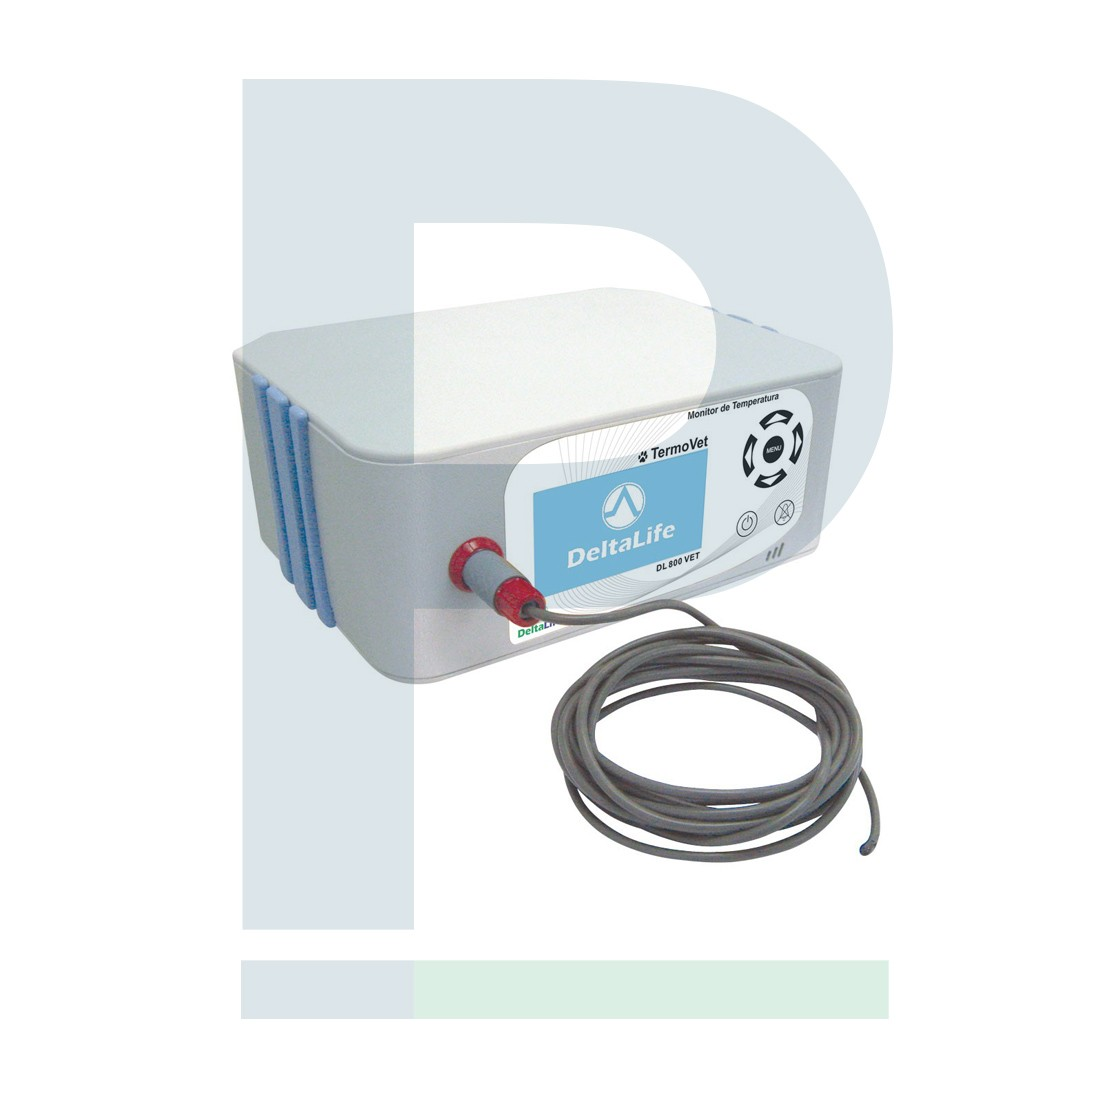 Monitor De Temperatura - Termo Vet DL 800